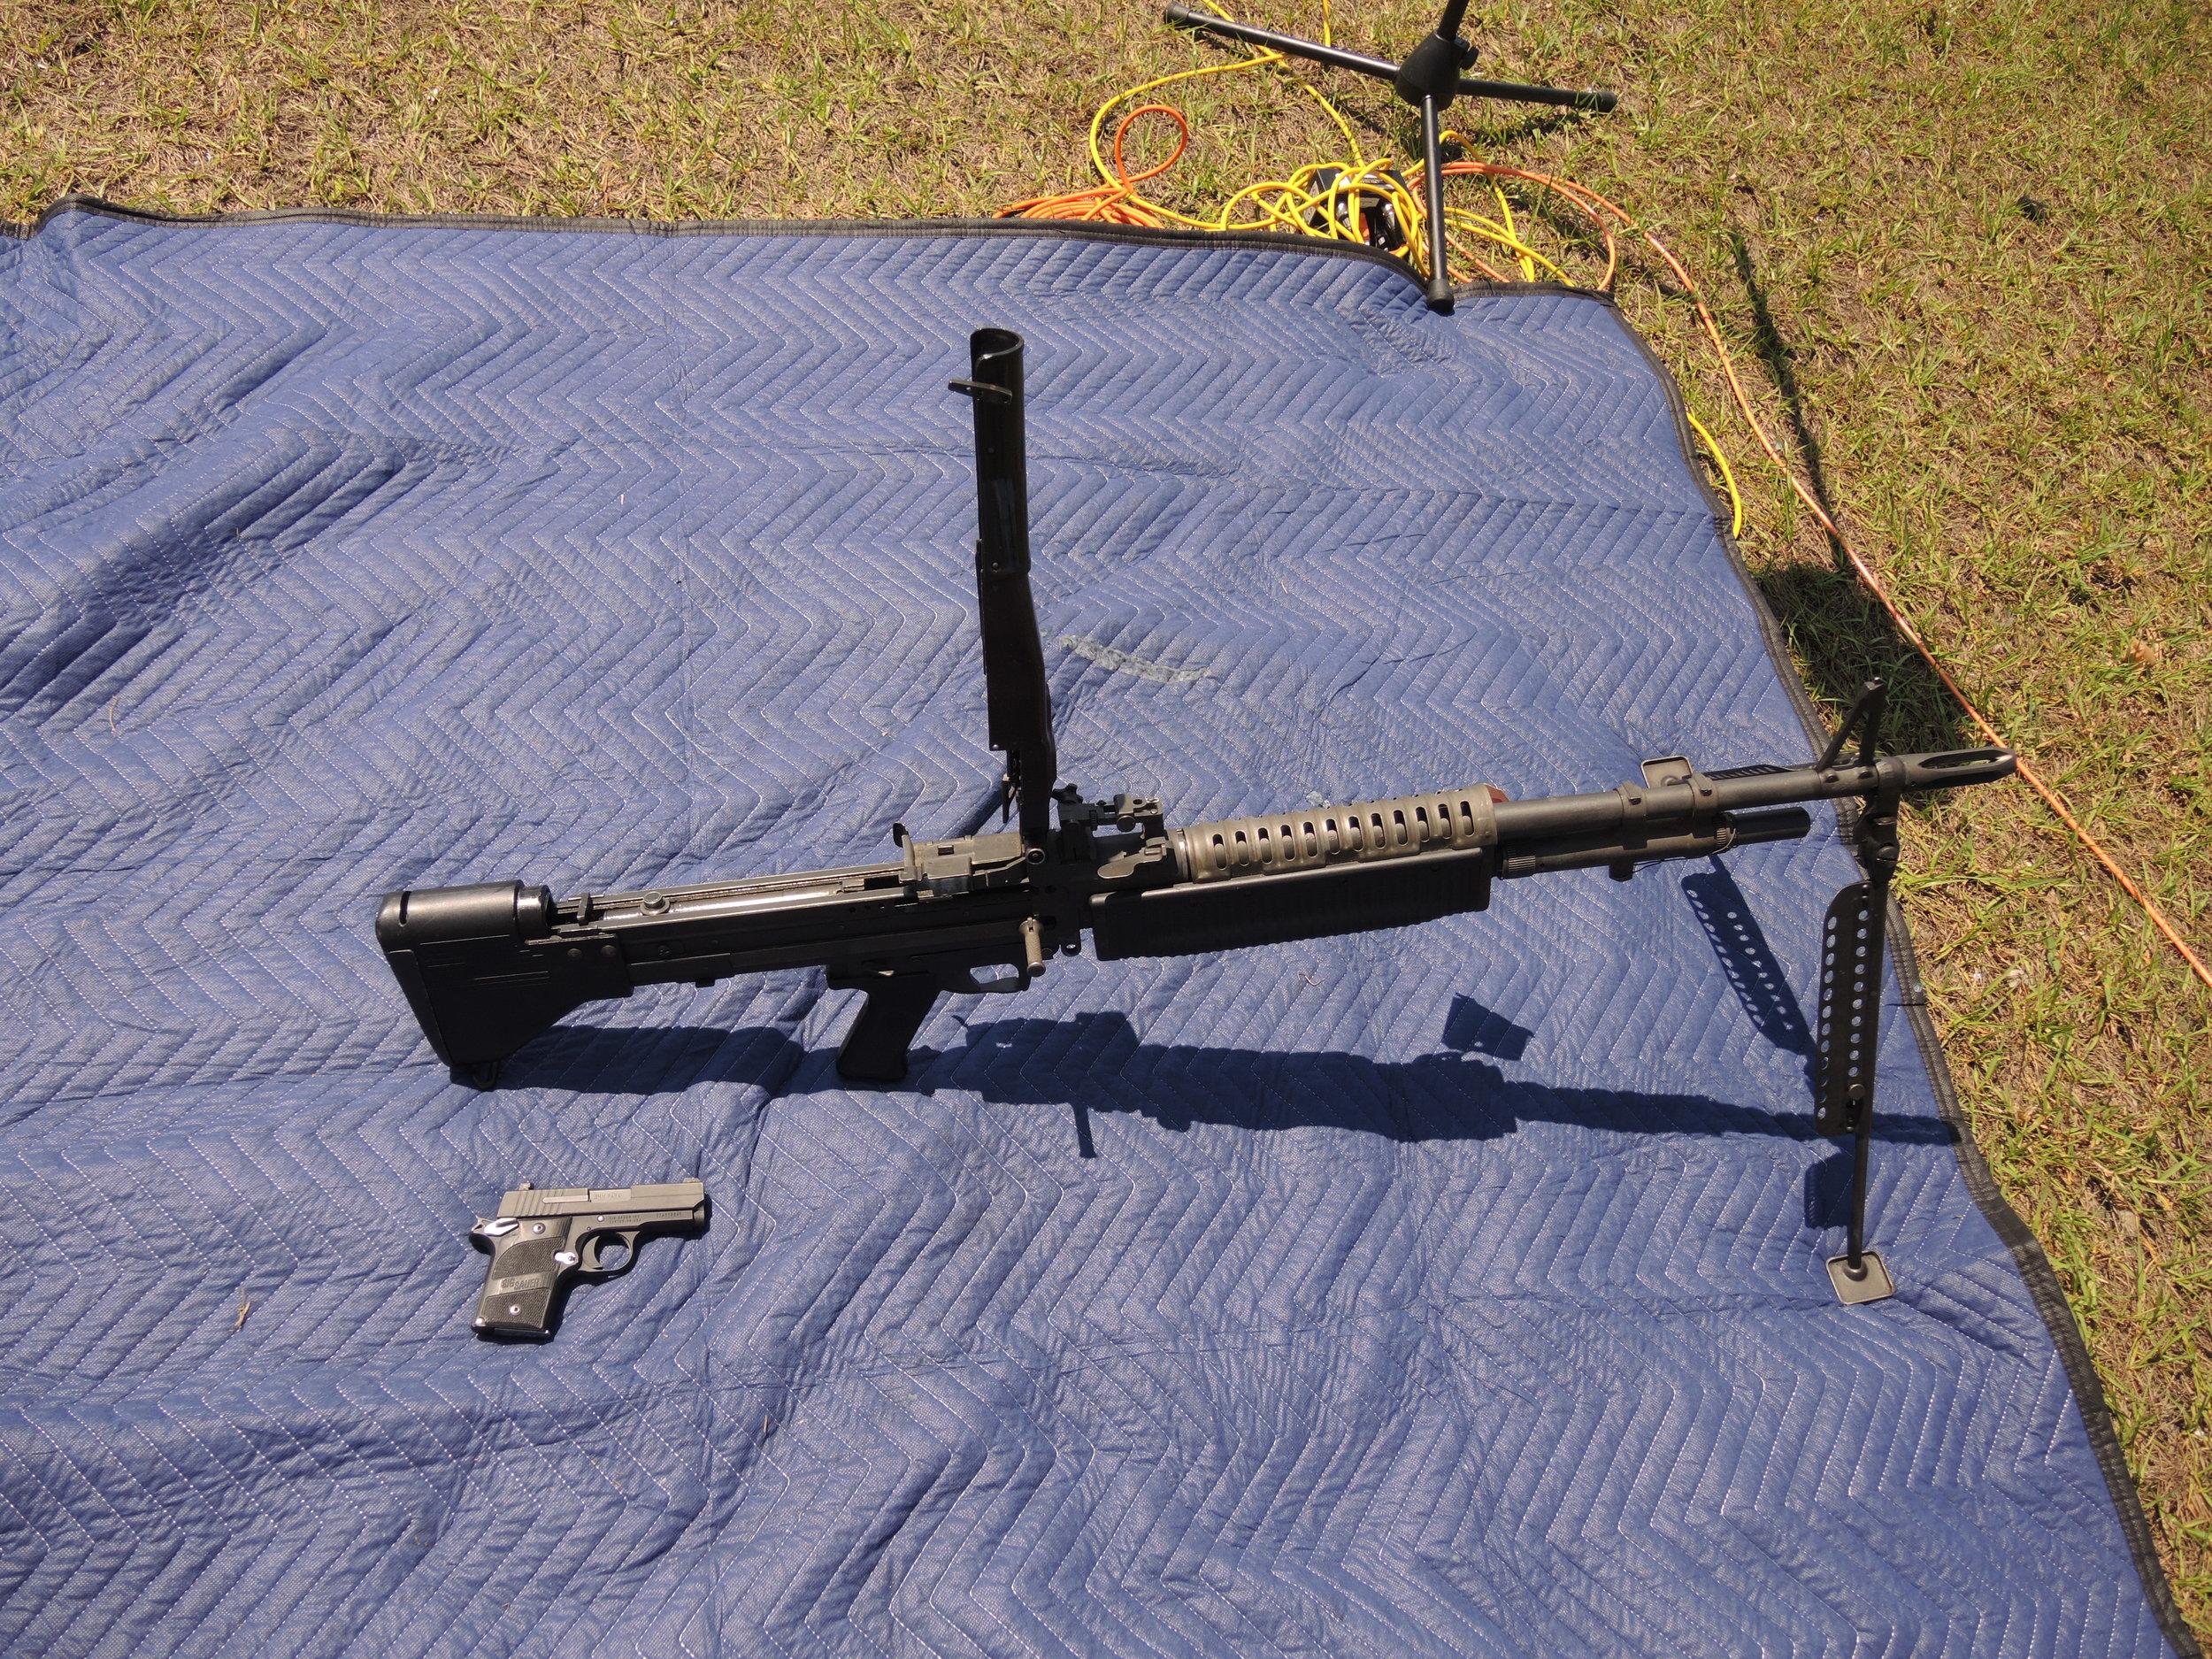 DSCN9968 M60 machine gun vs small 9mm pistol.JPG